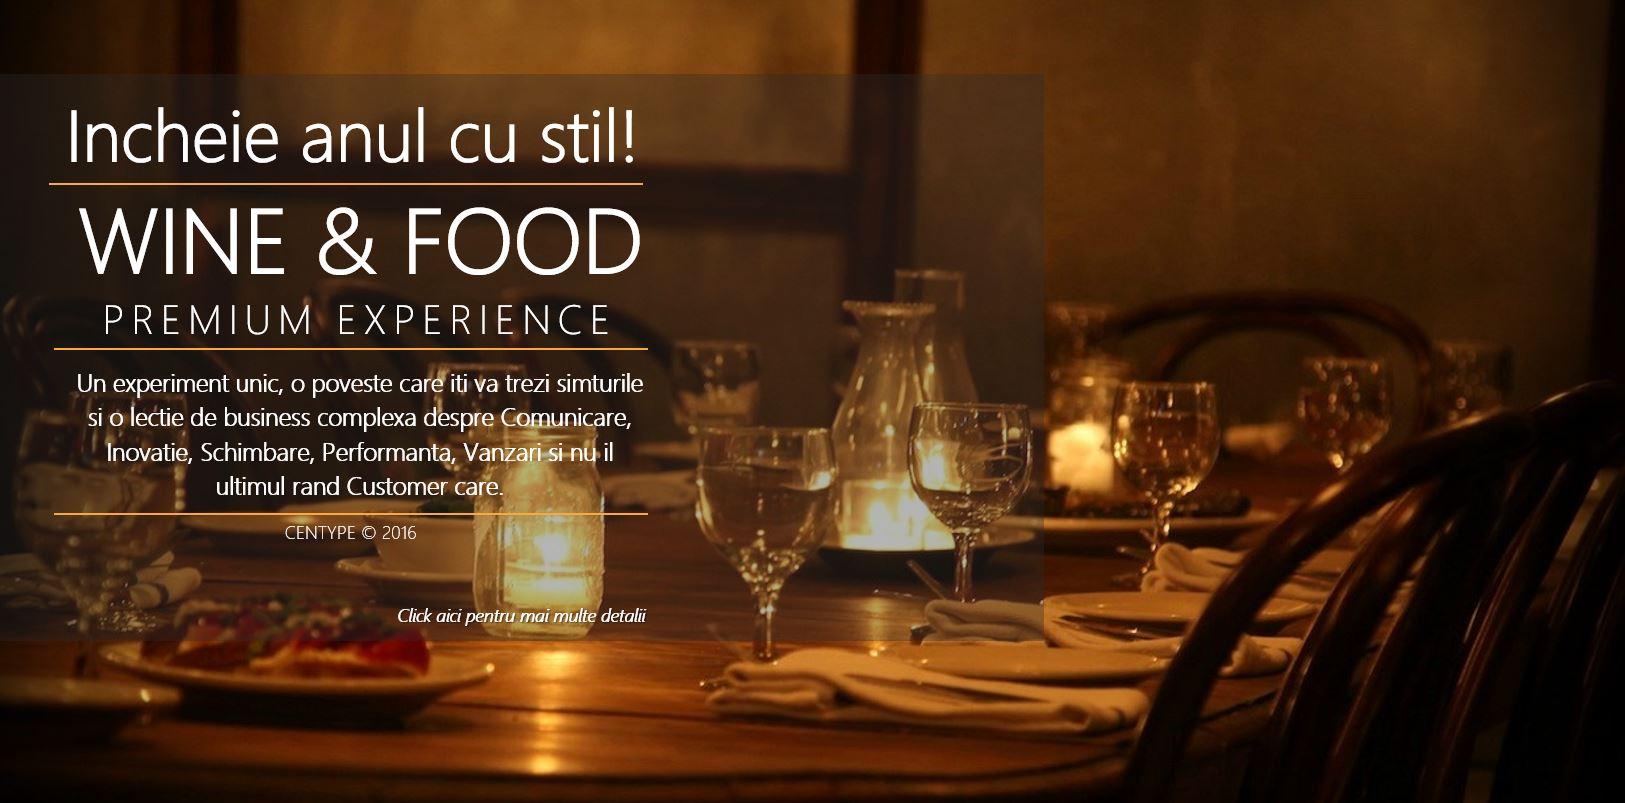 Wine and food paring Premium Experience Centype